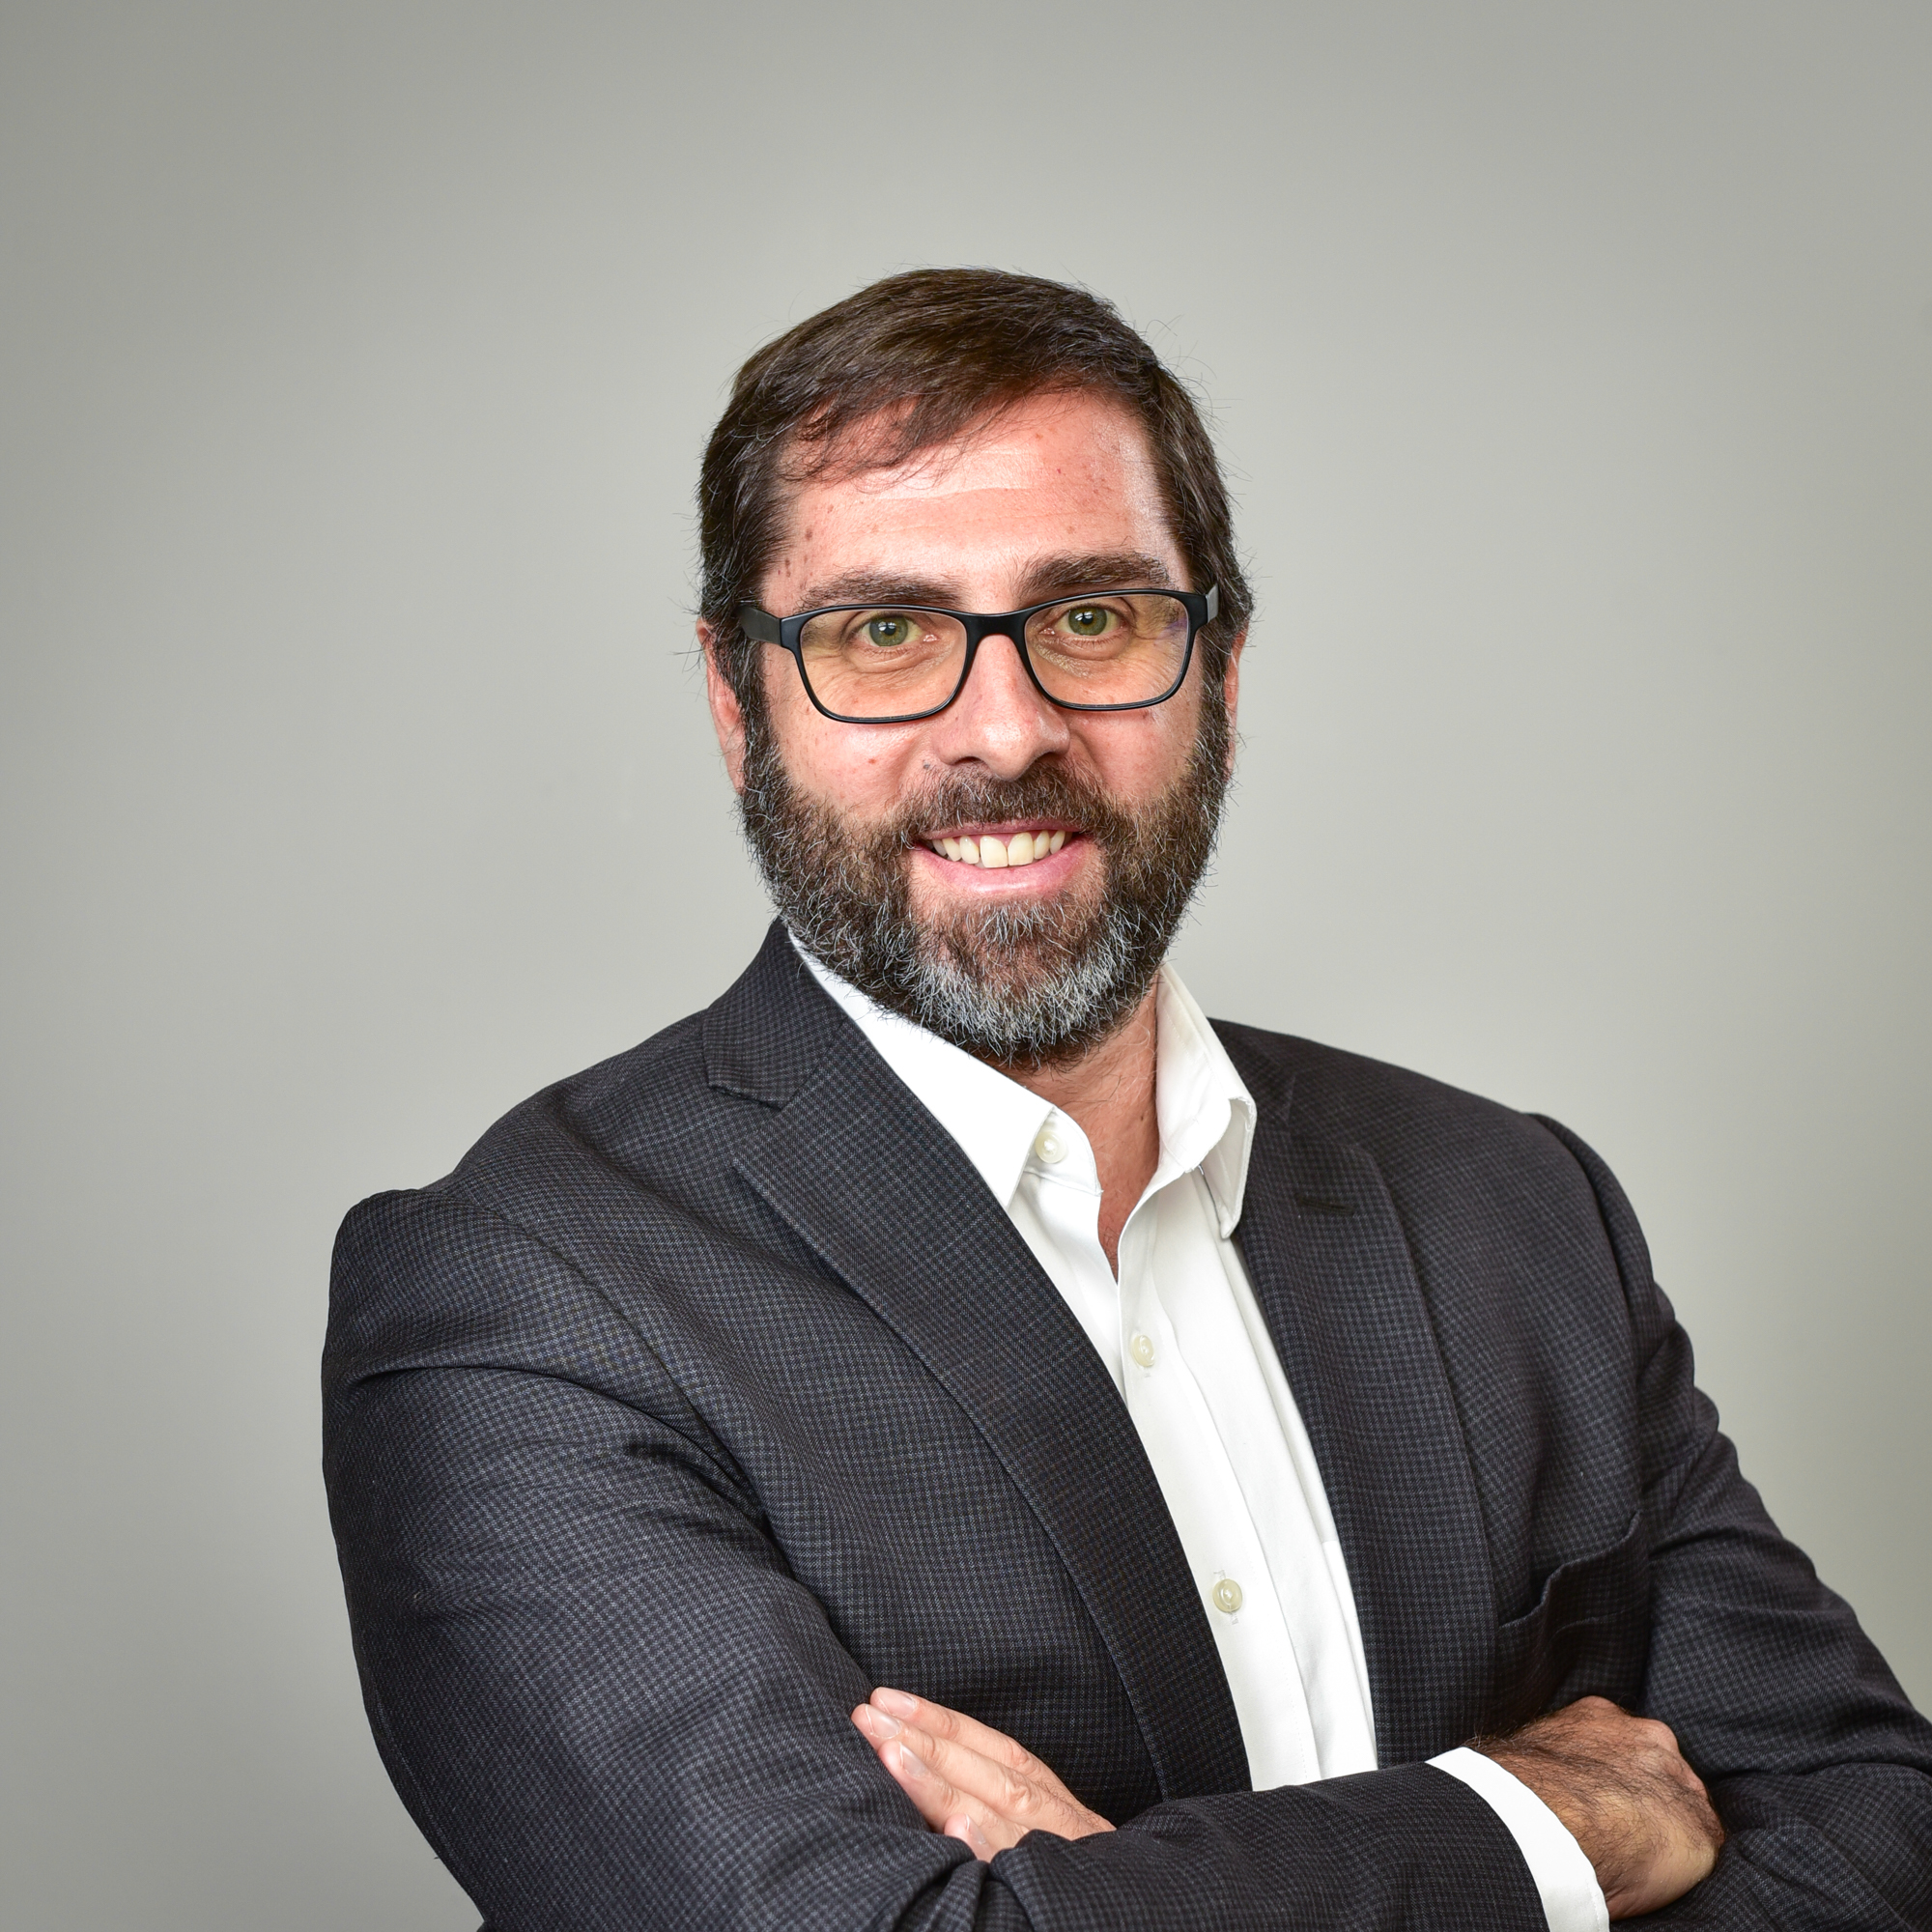 Diego Serebrisky